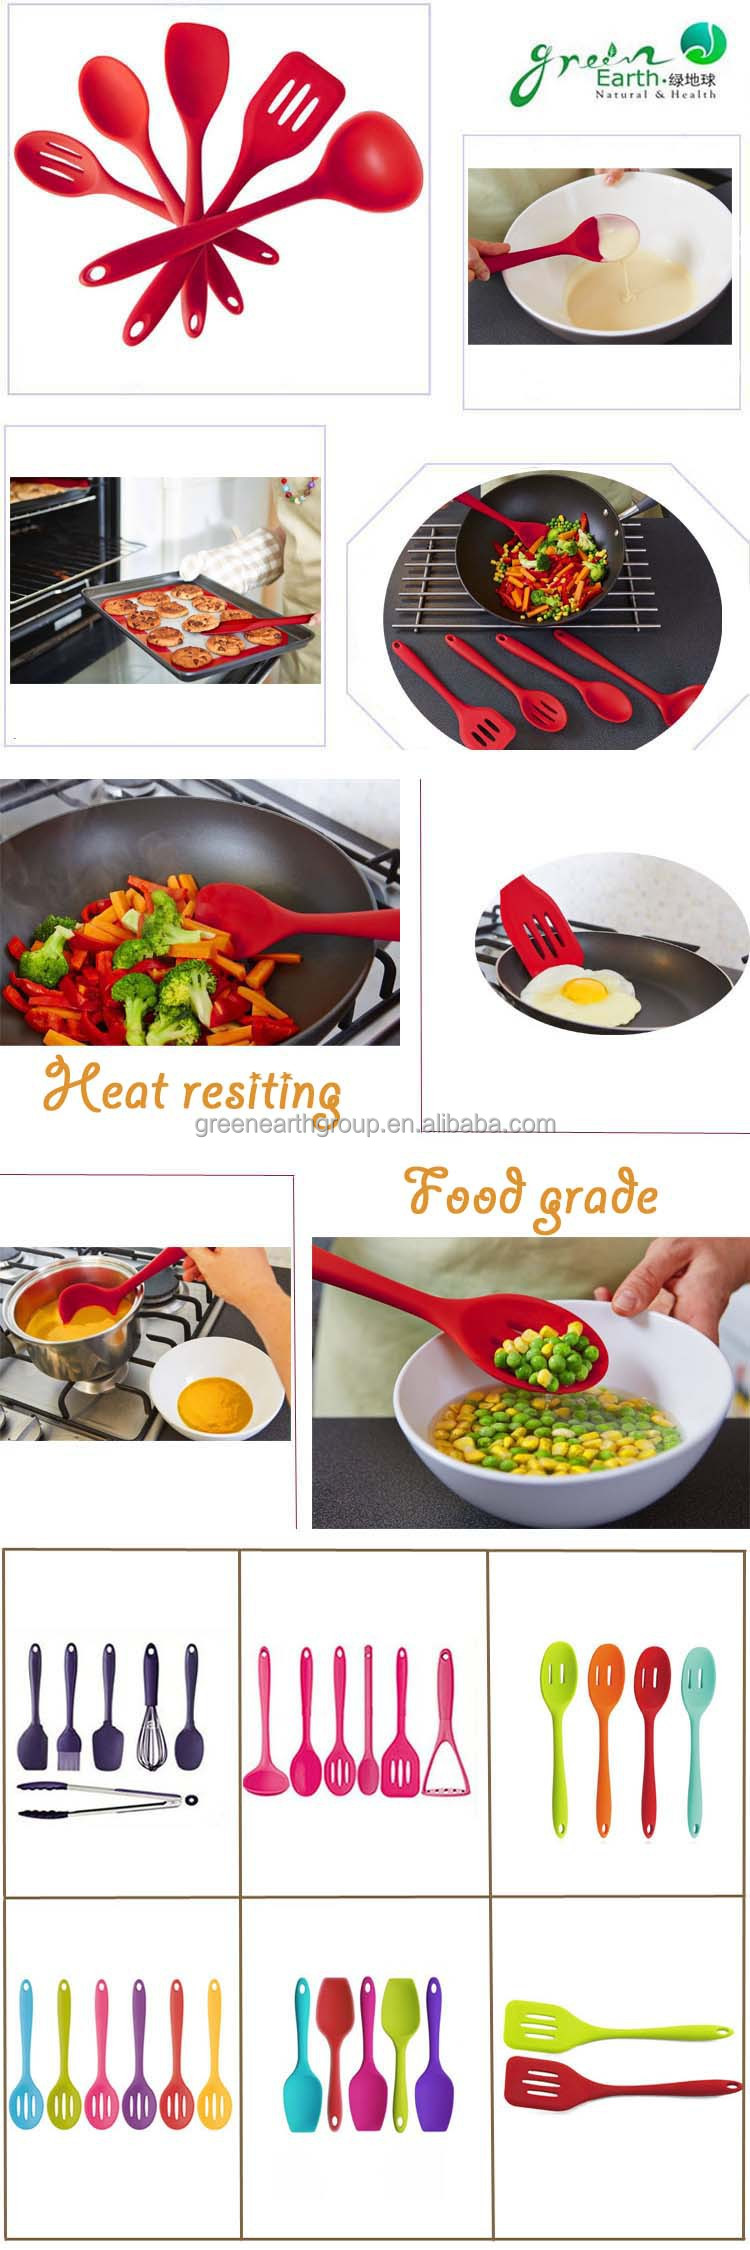 2015 Hot Sale food grade nylon silicone kitchen tool set/silicone kitchen accessories/ colorful bbq silicone kitchen utensil